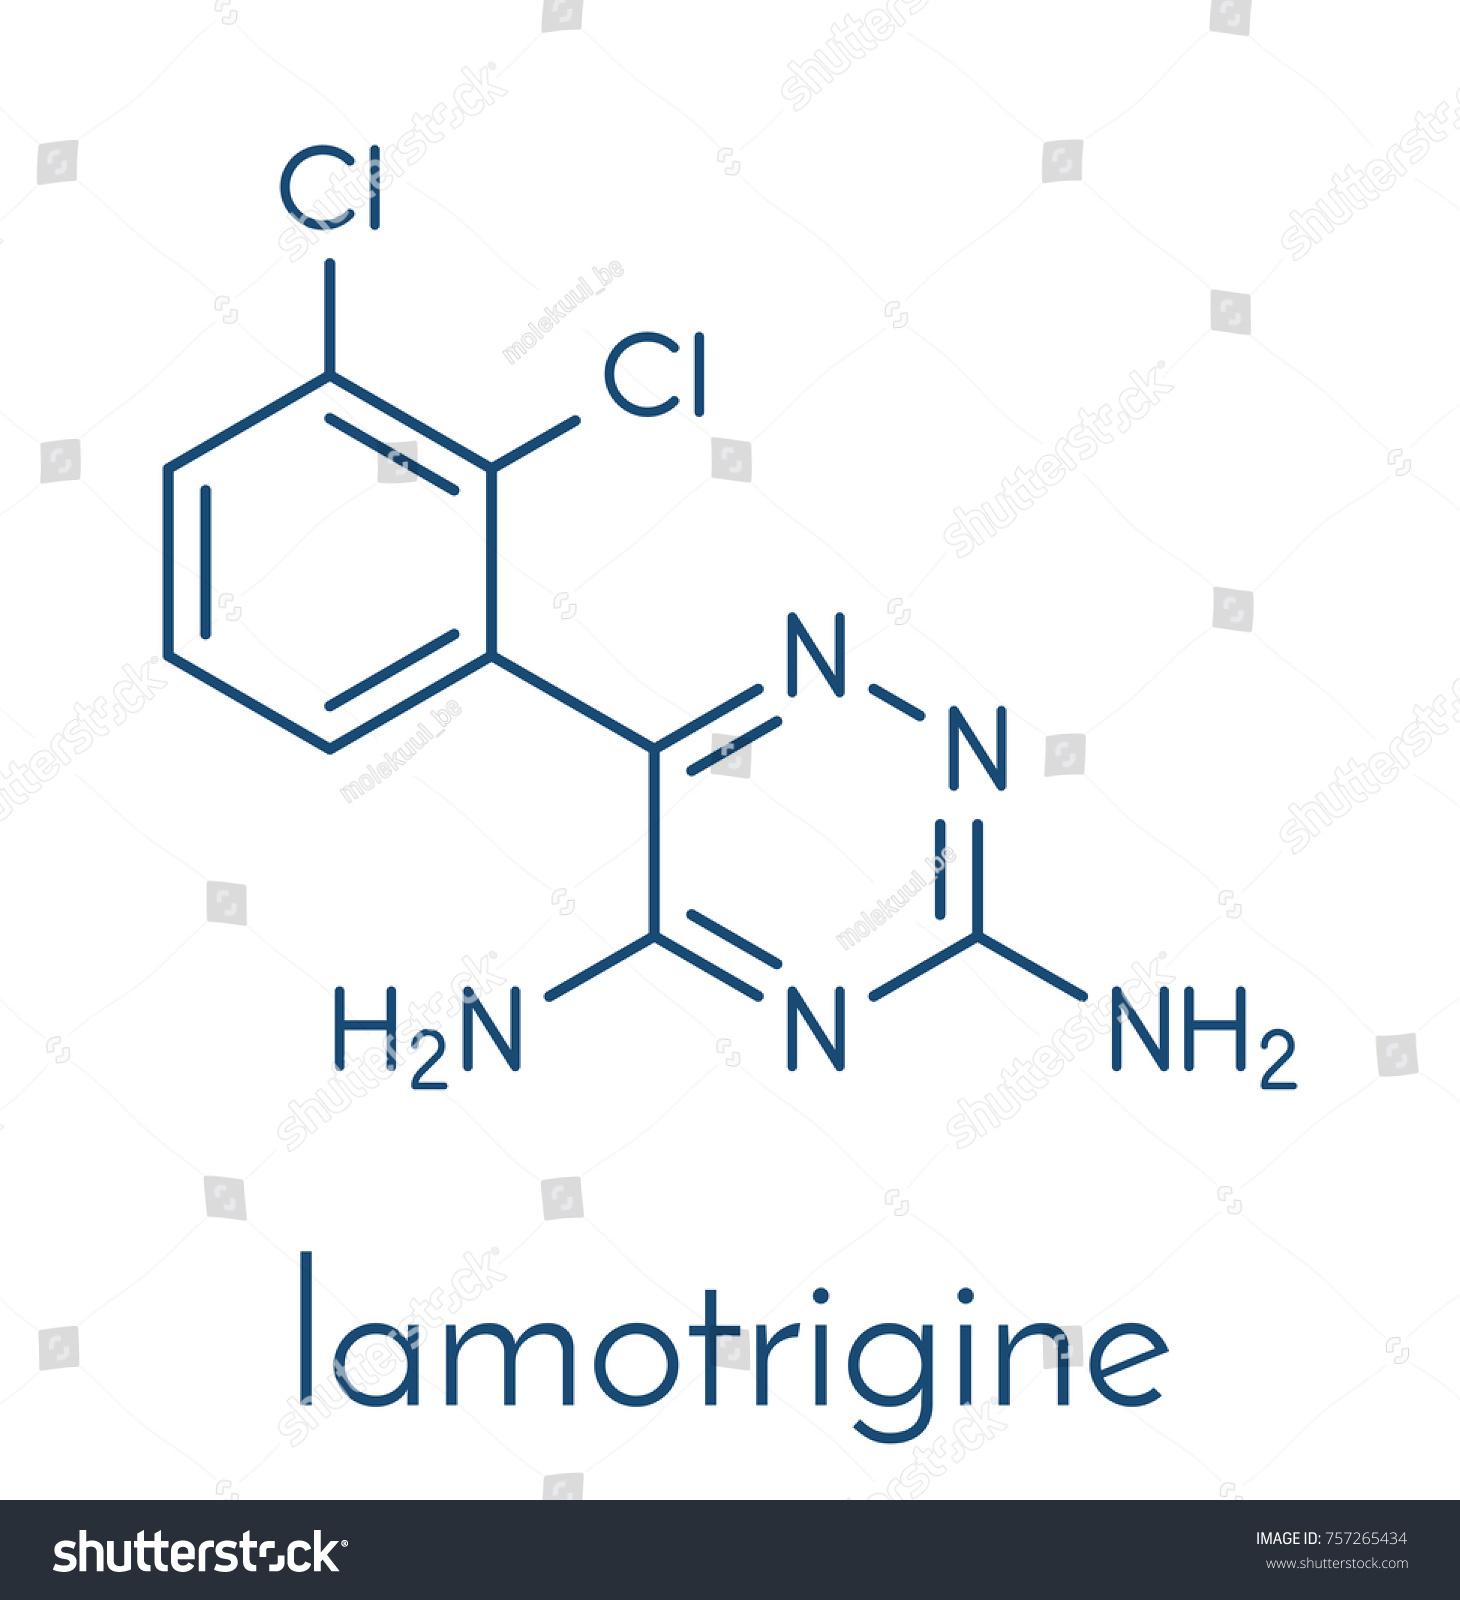 Lamotrigine seizures drug molecule used treatment stock vector lamotrigine seizures drug molecule used in treatment of epilepsy and bipolar disorder skeletal formula biocorpaavc Gallery